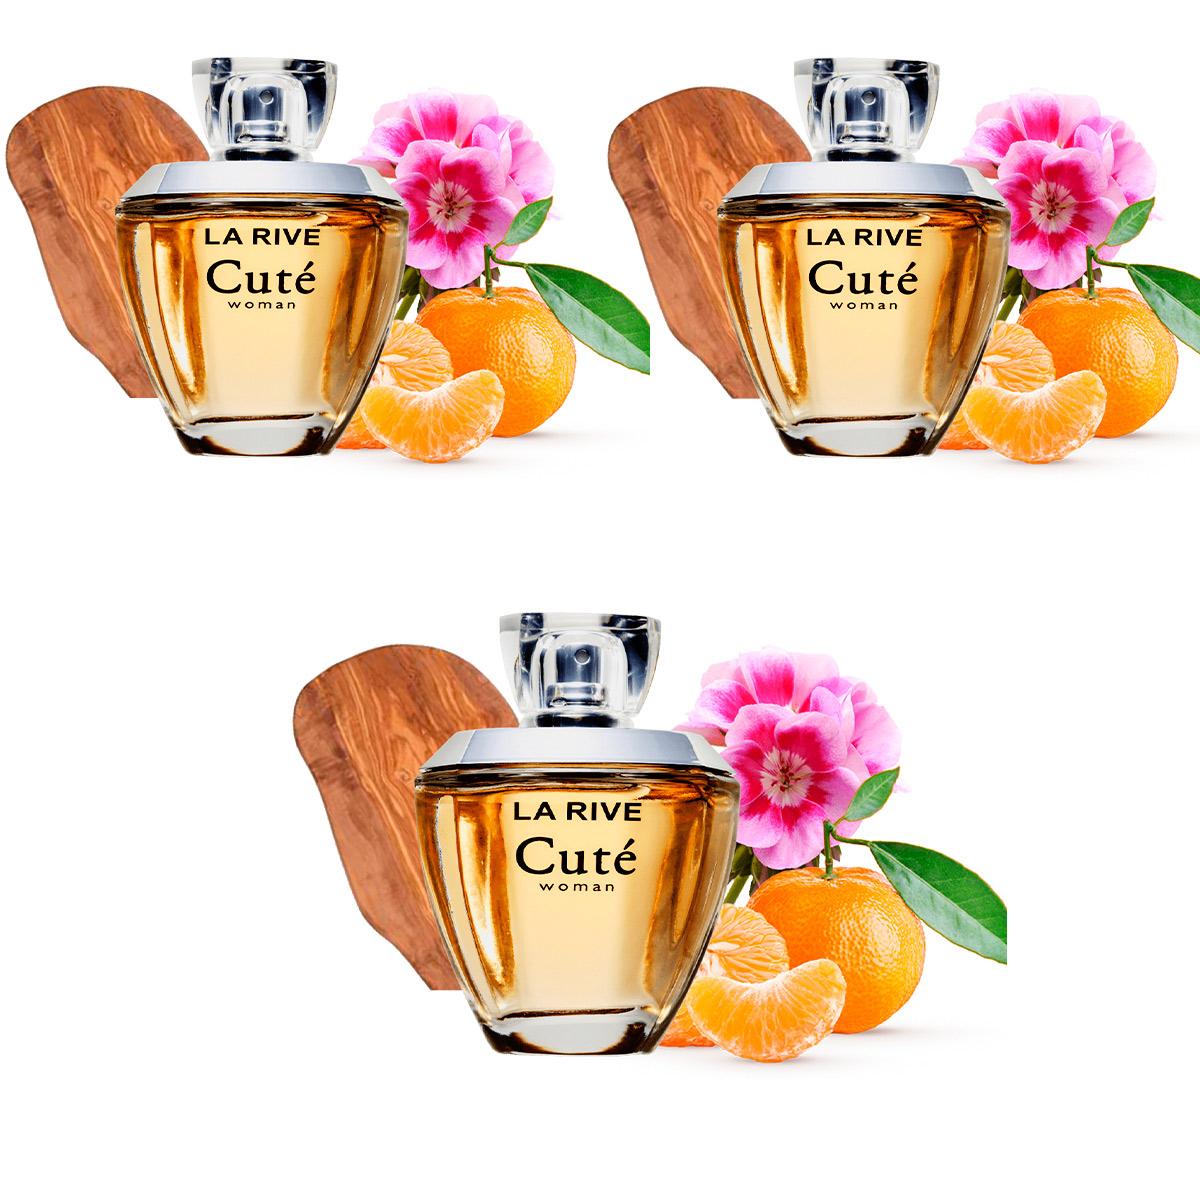 Kit 3 Perfumes Importados Feminino Cuté 100 ml La Rive